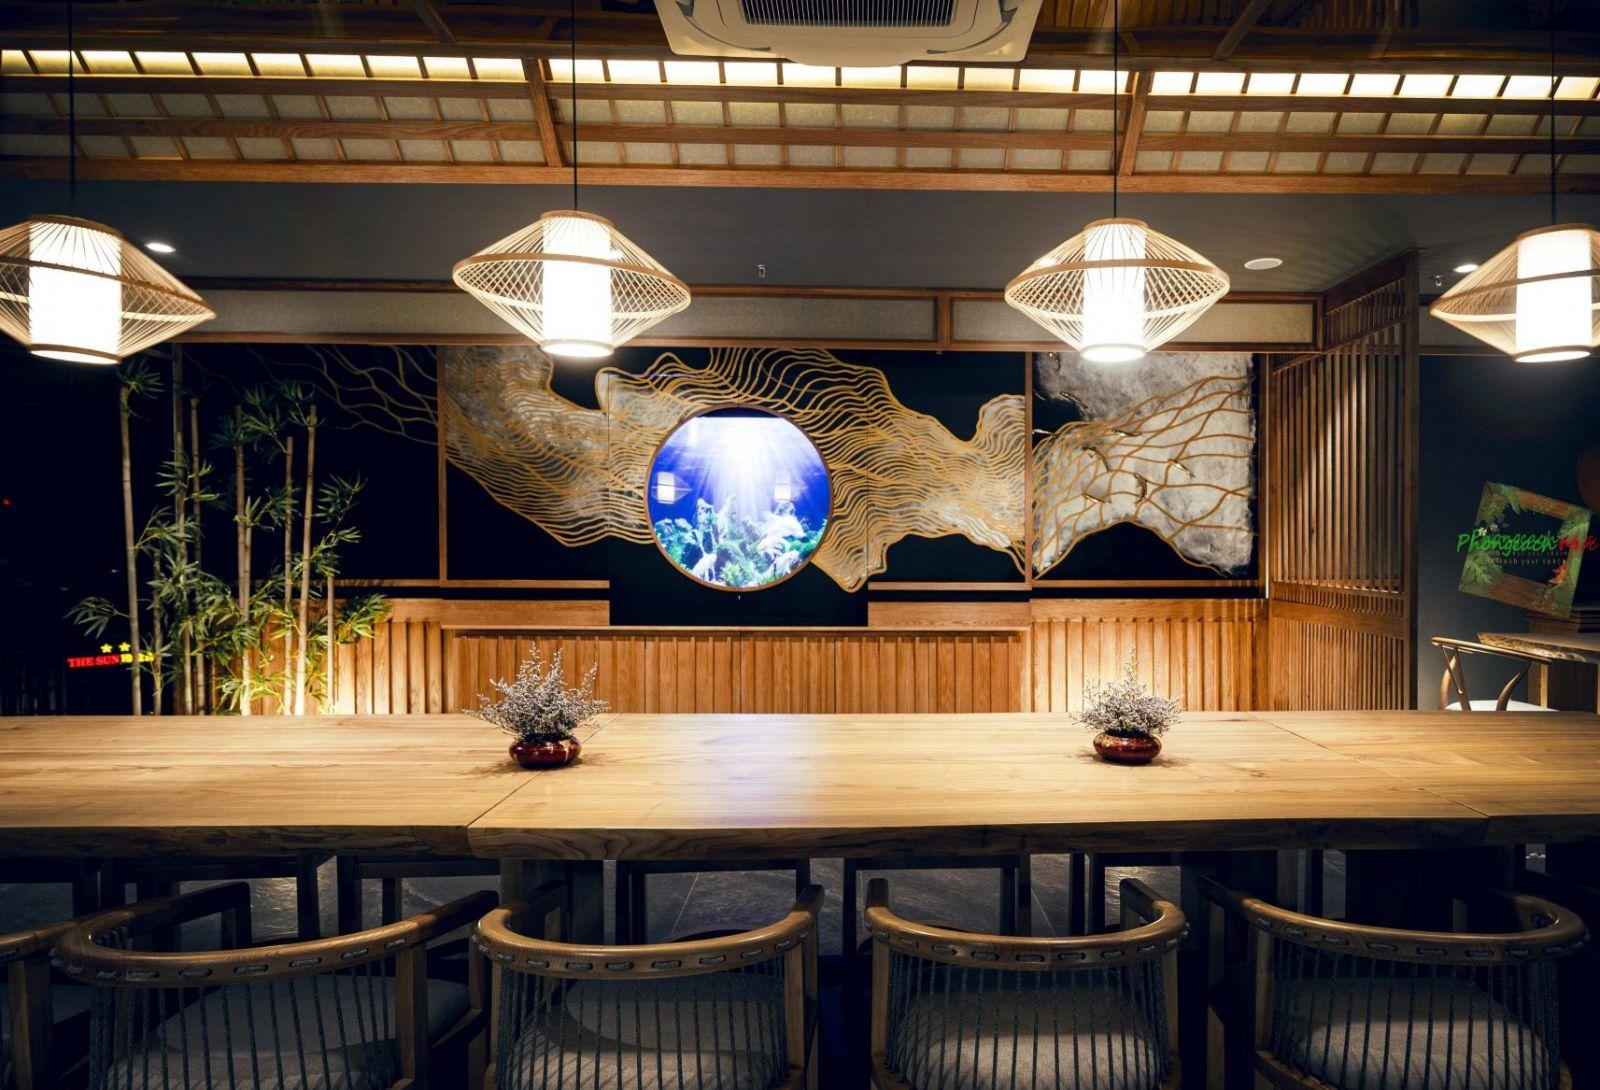 khong-gian-noi-that-nha-hang-nhat-ban-sushi-world-signature-khu-vuc-phong-vip1-4